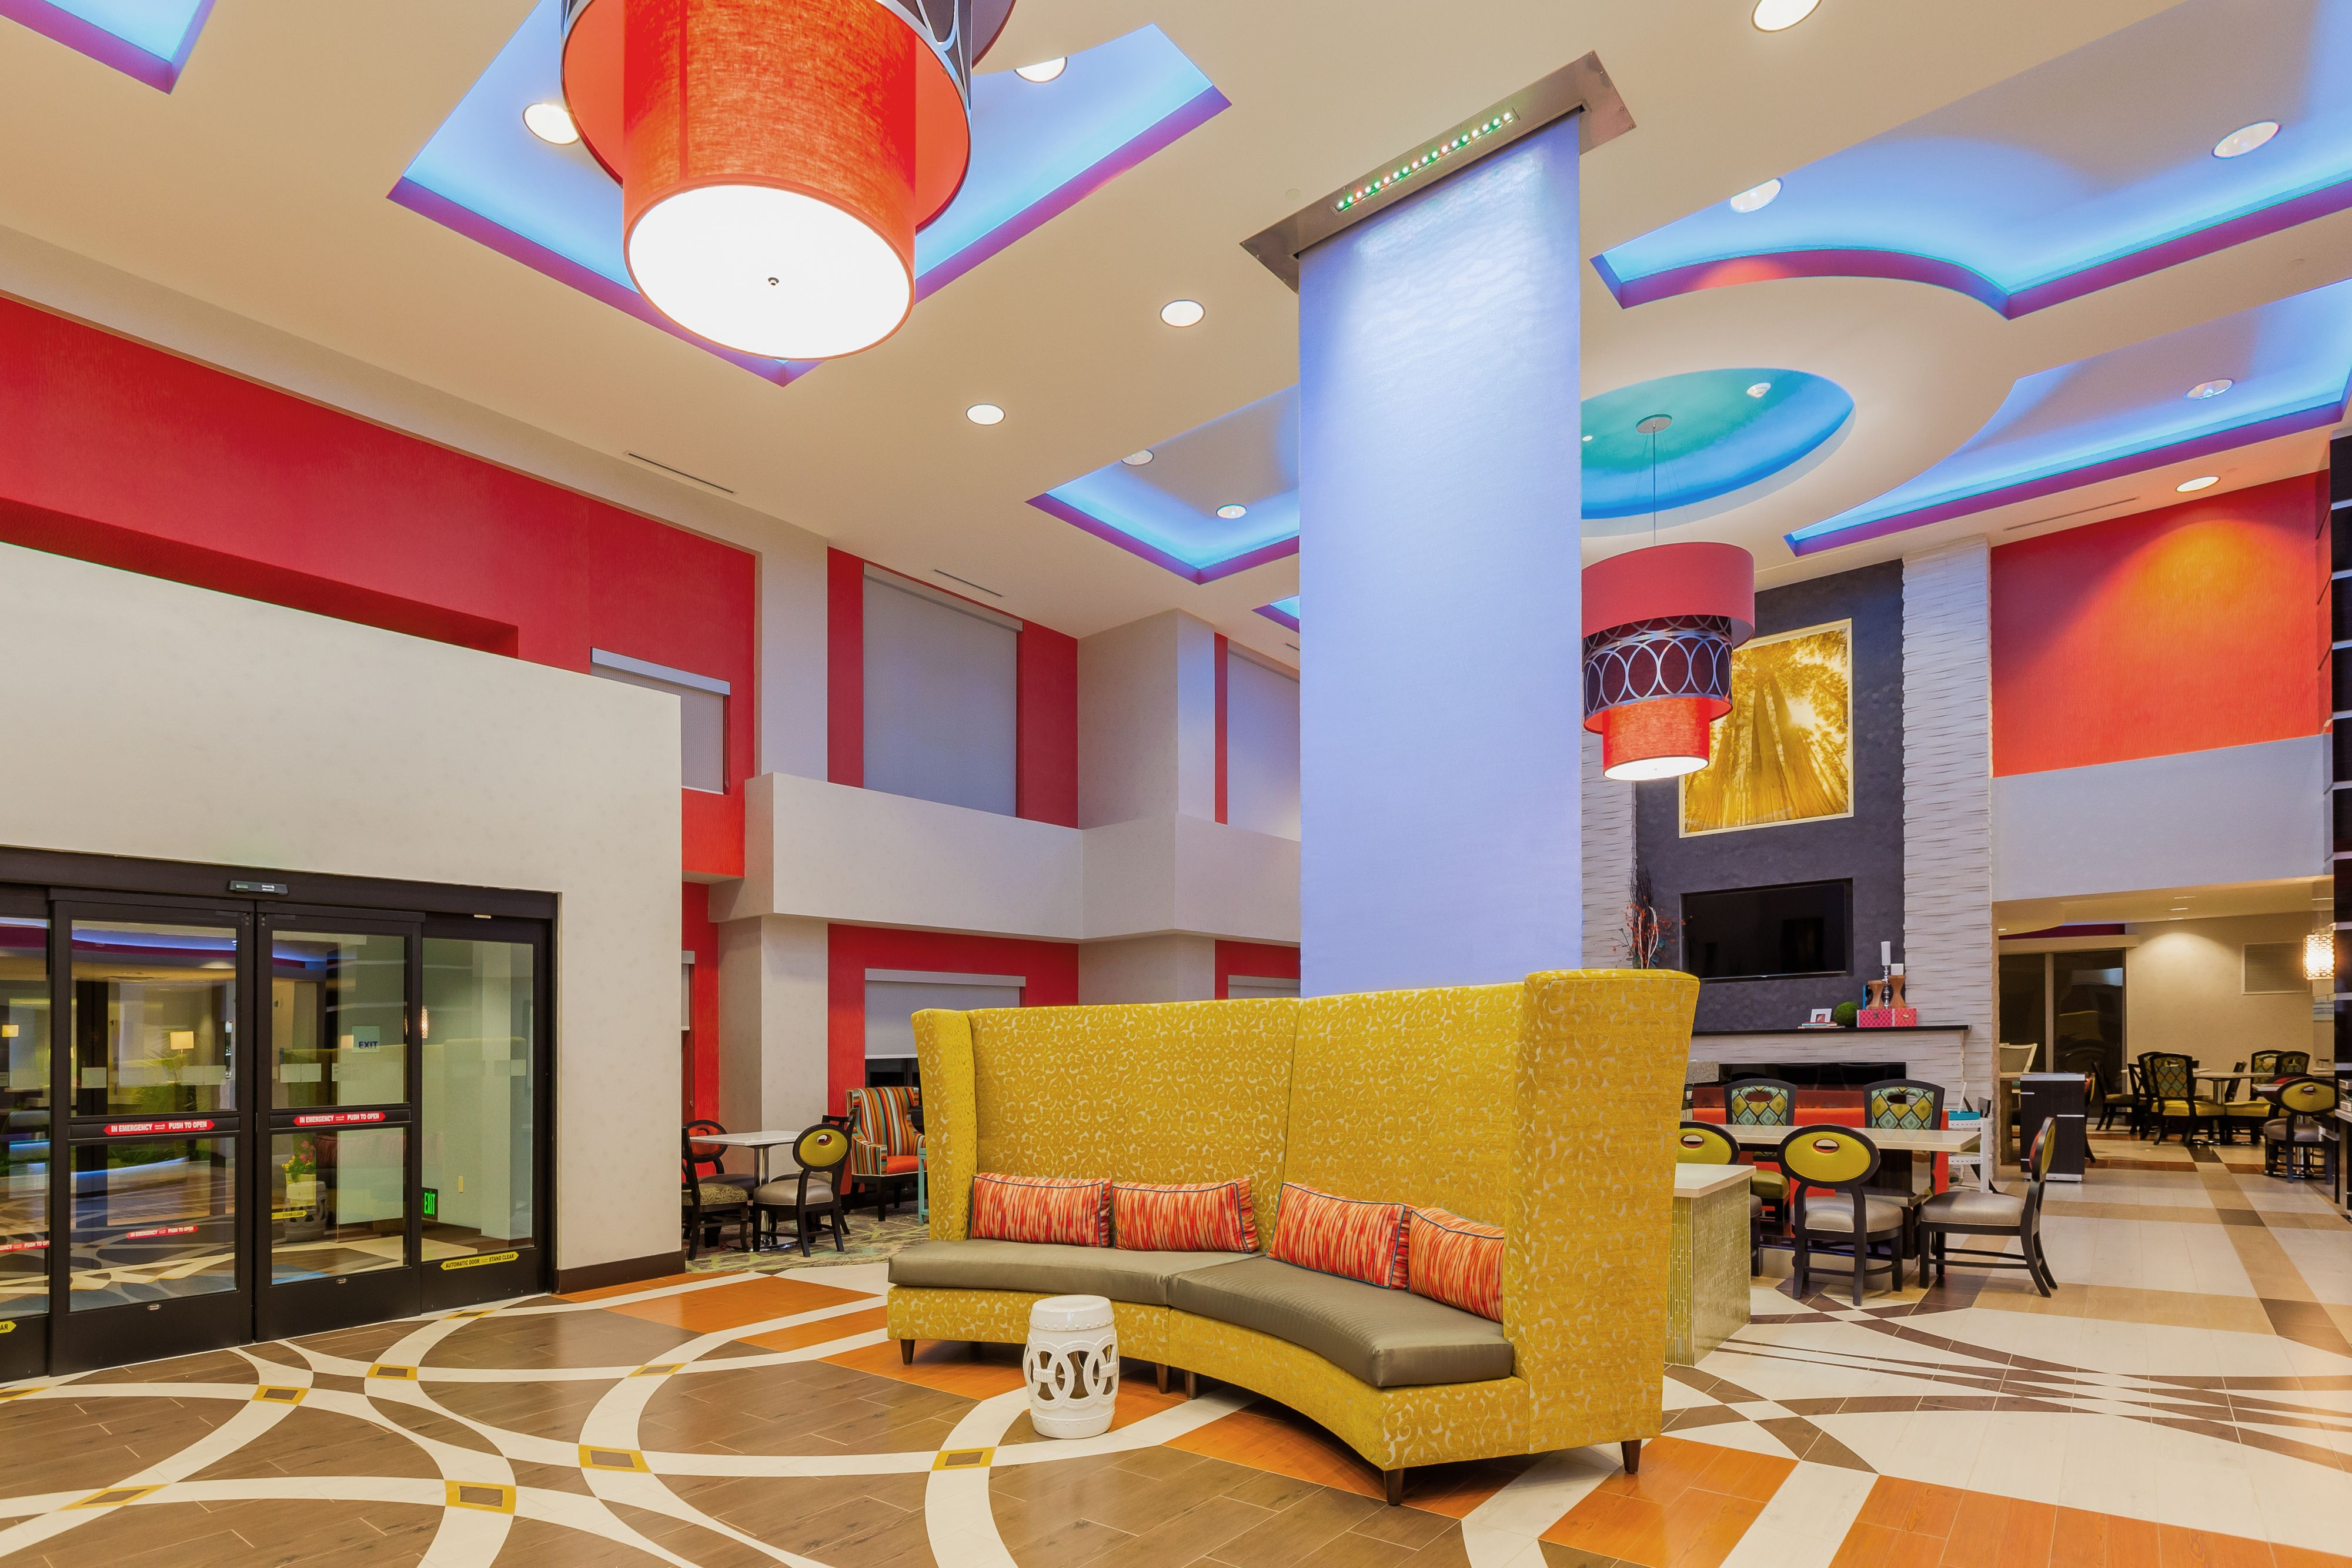 Holiday Inn Express & Suites Eureka image 6